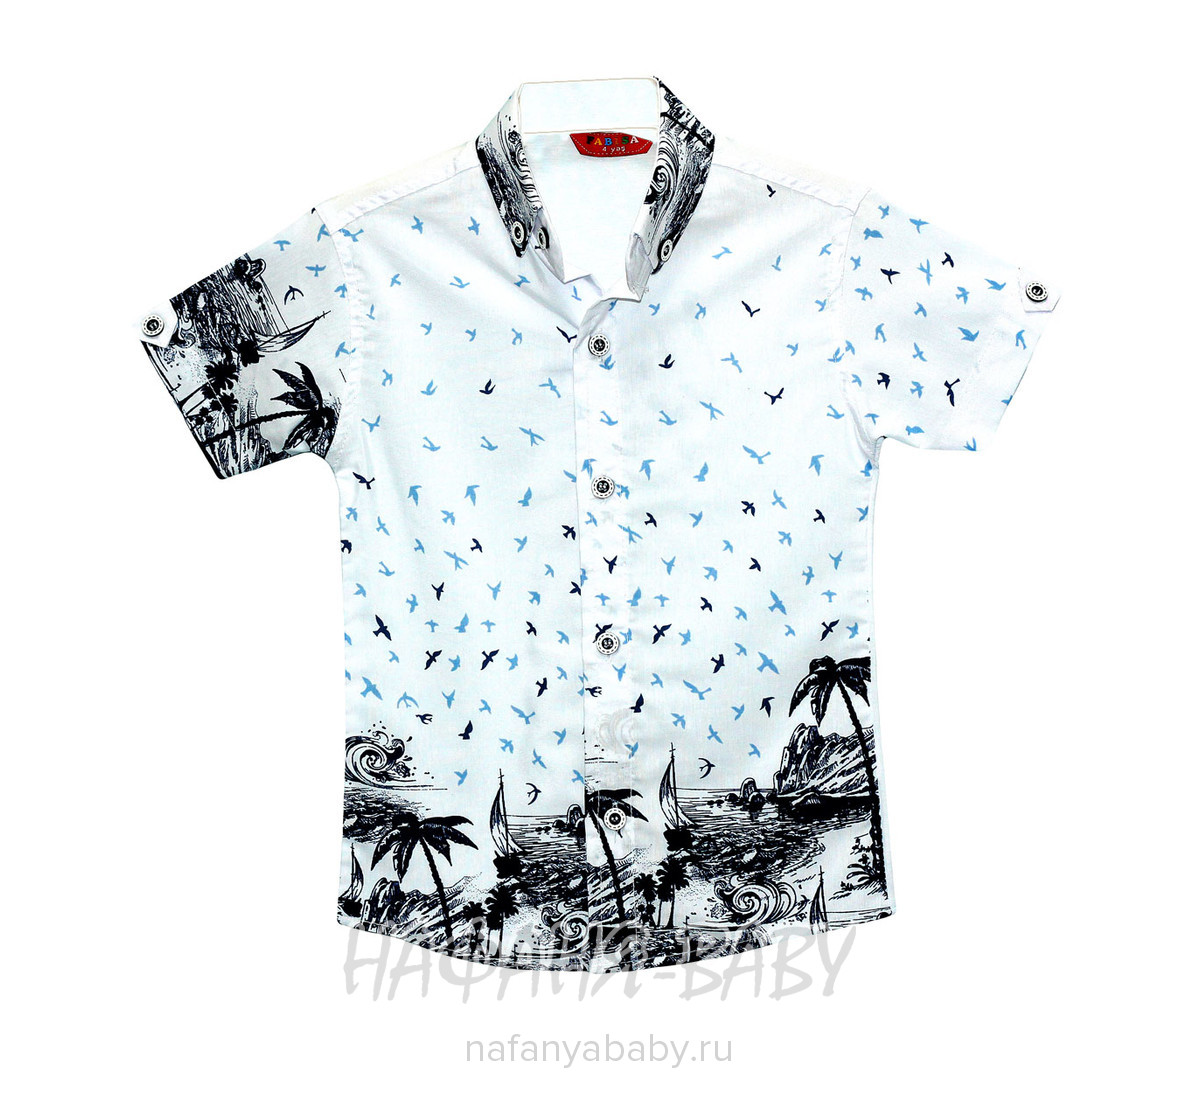 Детская рубашка, артикул 106 FABISA арт: 106, 1-4 года, цвет белый с голубым, оптом Турция